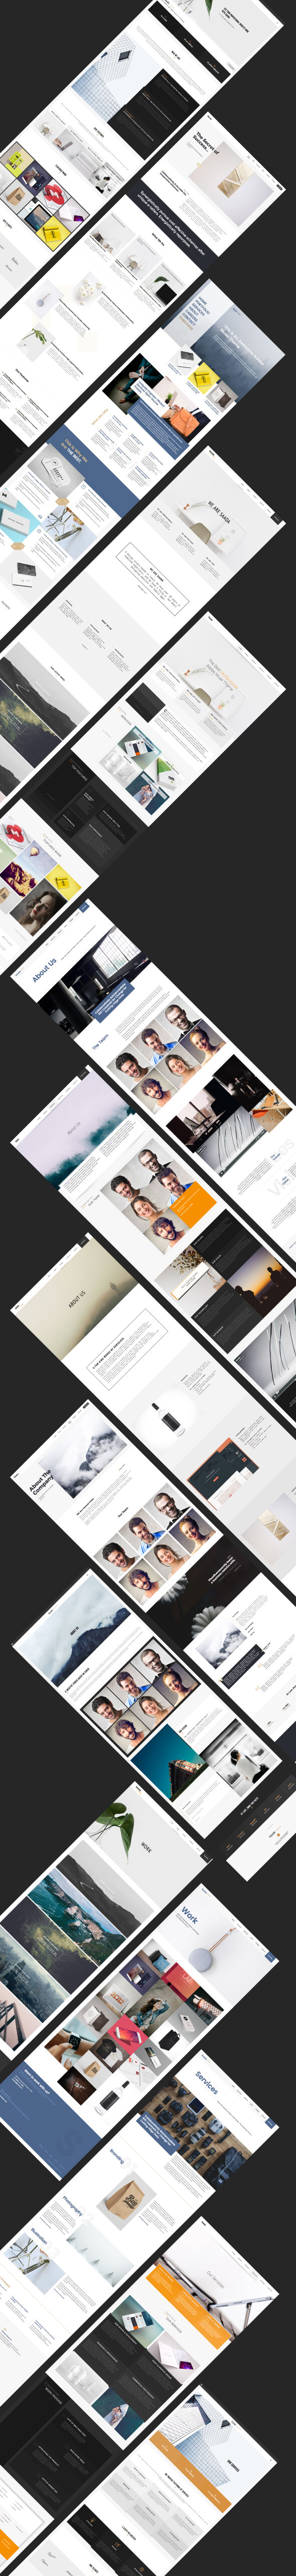 Safal: 5-in-1 Responsive Creative Multipurpose Adobe Muse Theme - 4